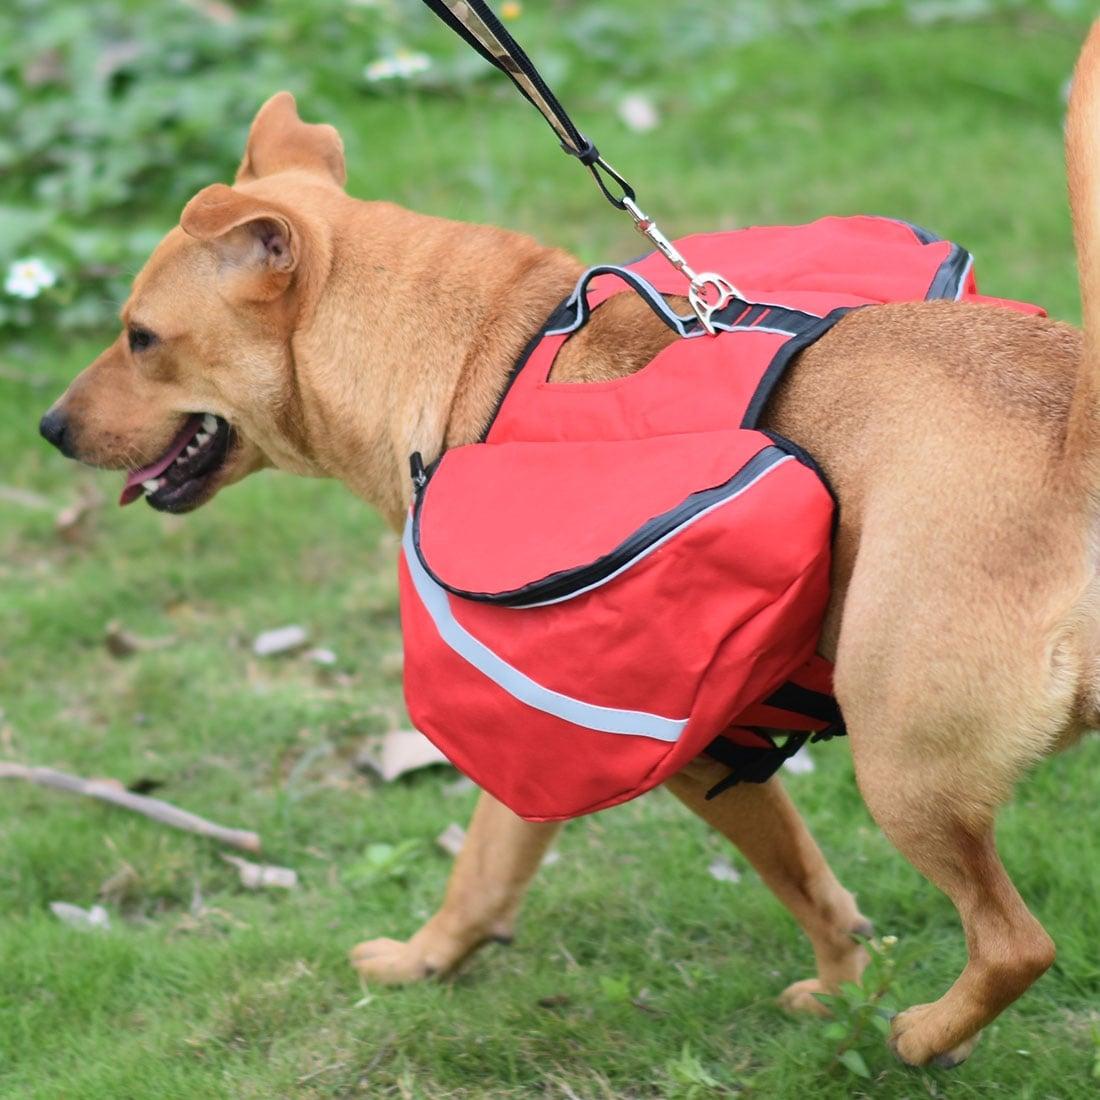 Dog Backpack Bag Pet Carrier Holder Bag for Outdoor Travel Hiking Camping (Camo Color - M)